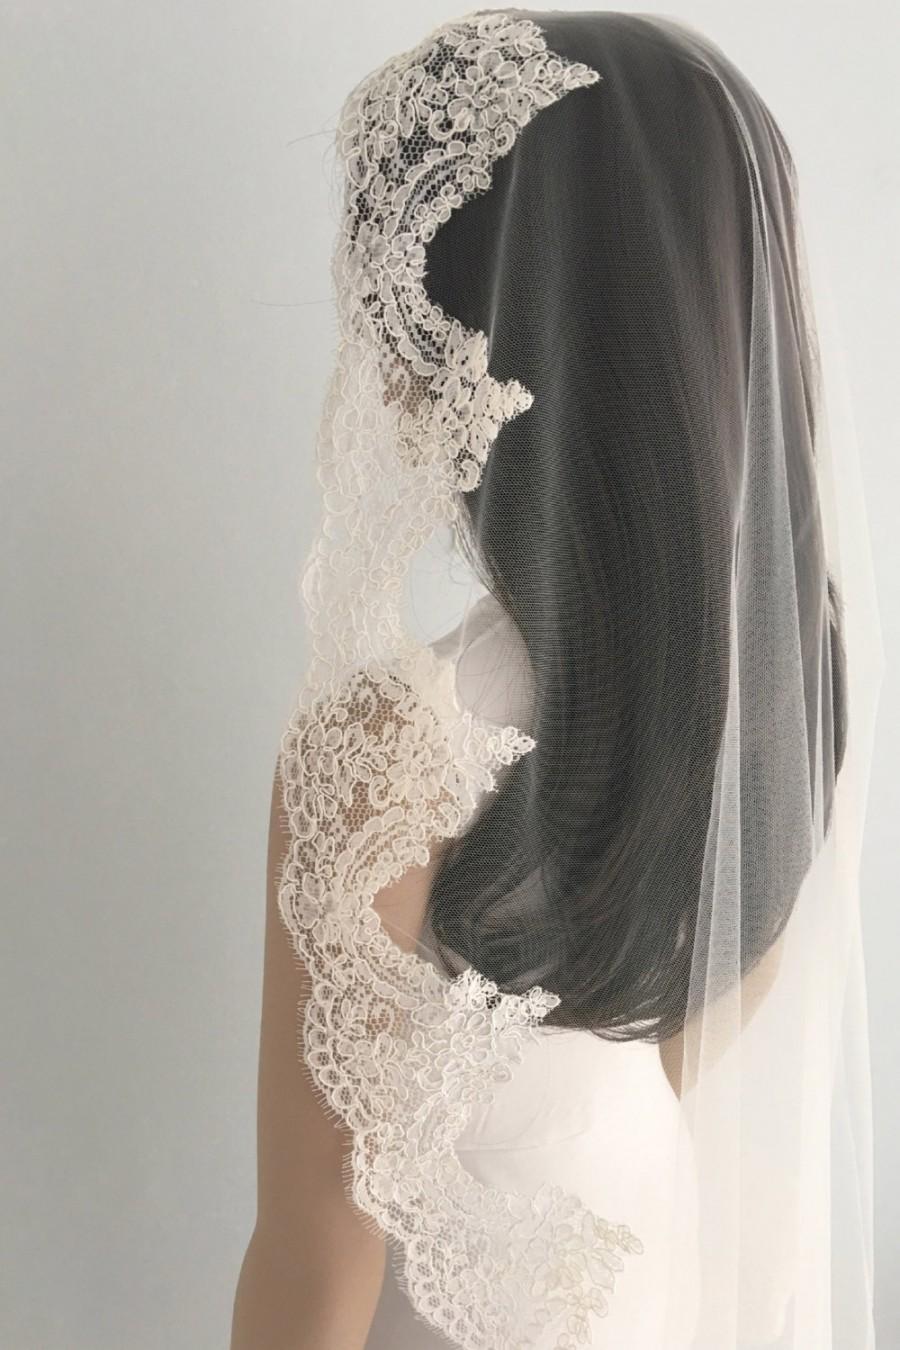 Wedding - Mantilla lace wedding veil, Mantilla Wedding Veil, Mantilla bridal veil, Spanish veil, Mantilla veil